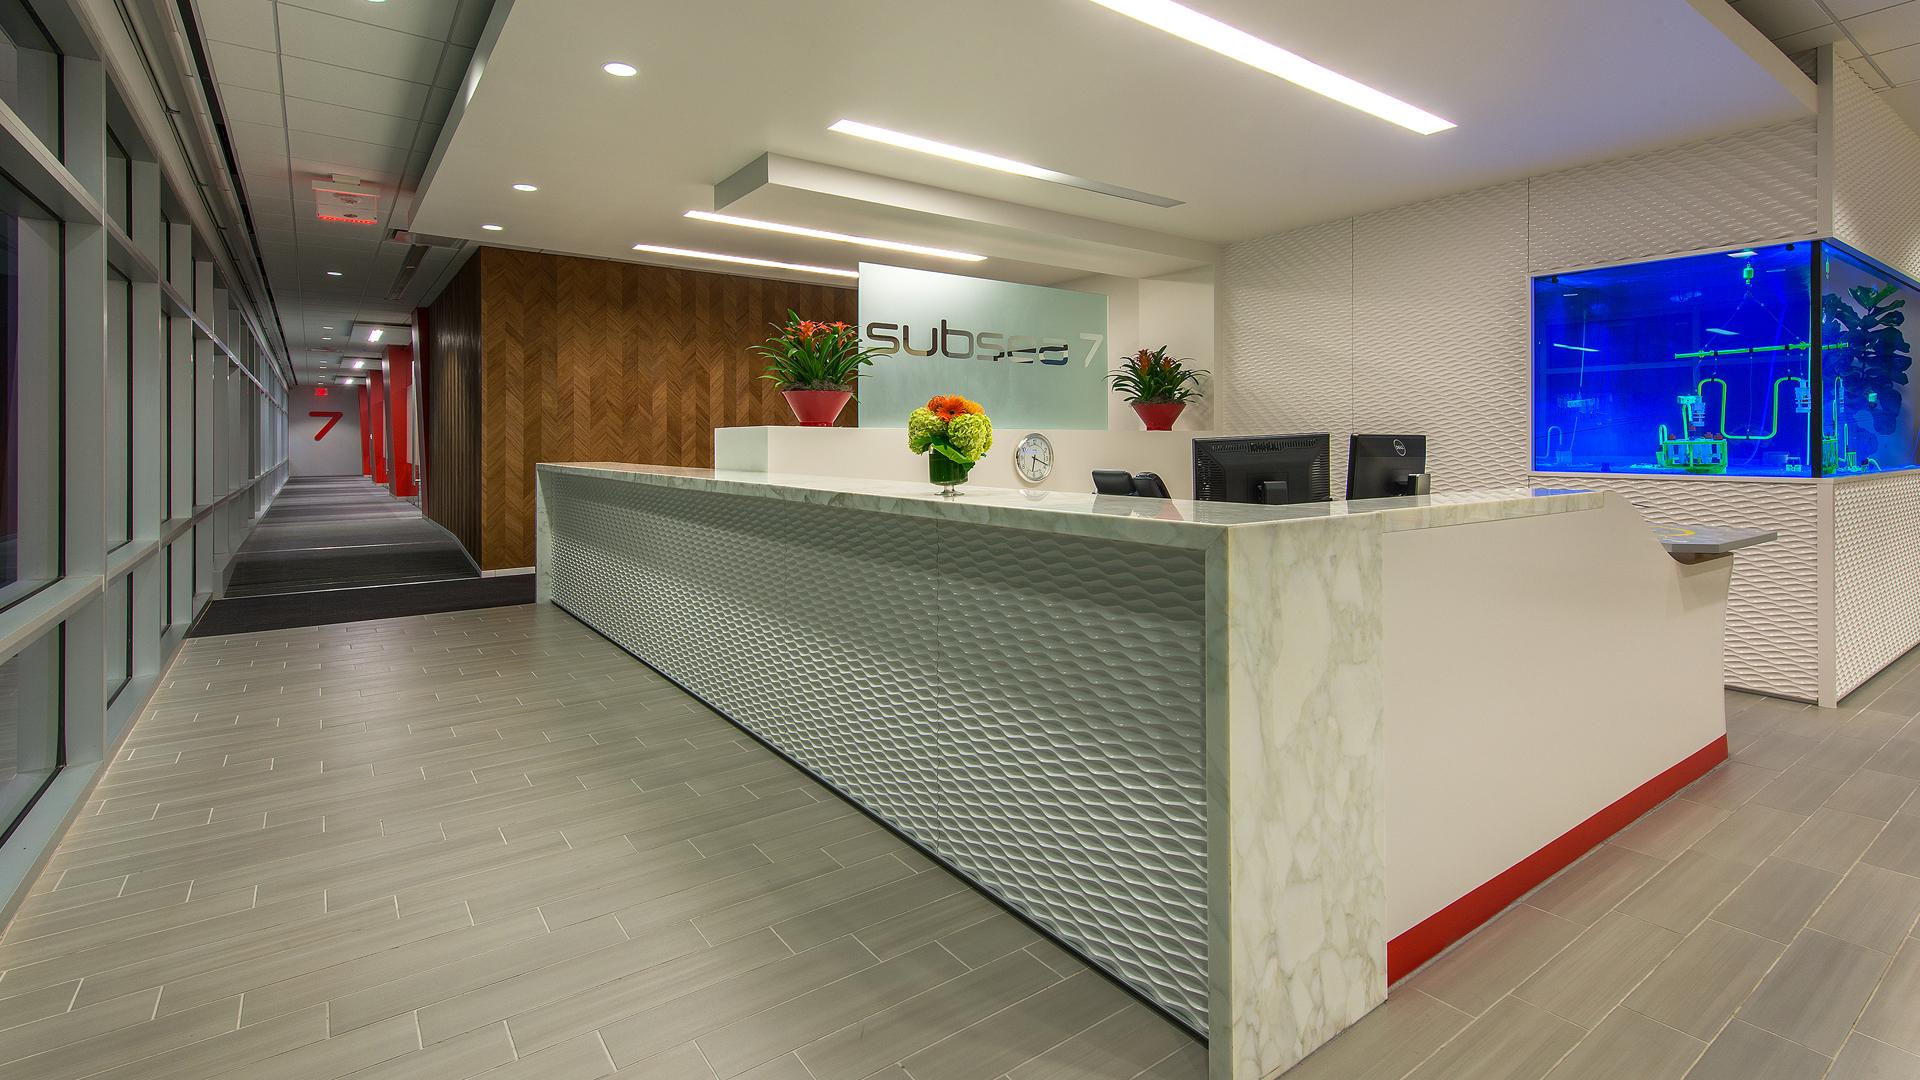 Subsea 7 Houston Corporate Interior Design Reception